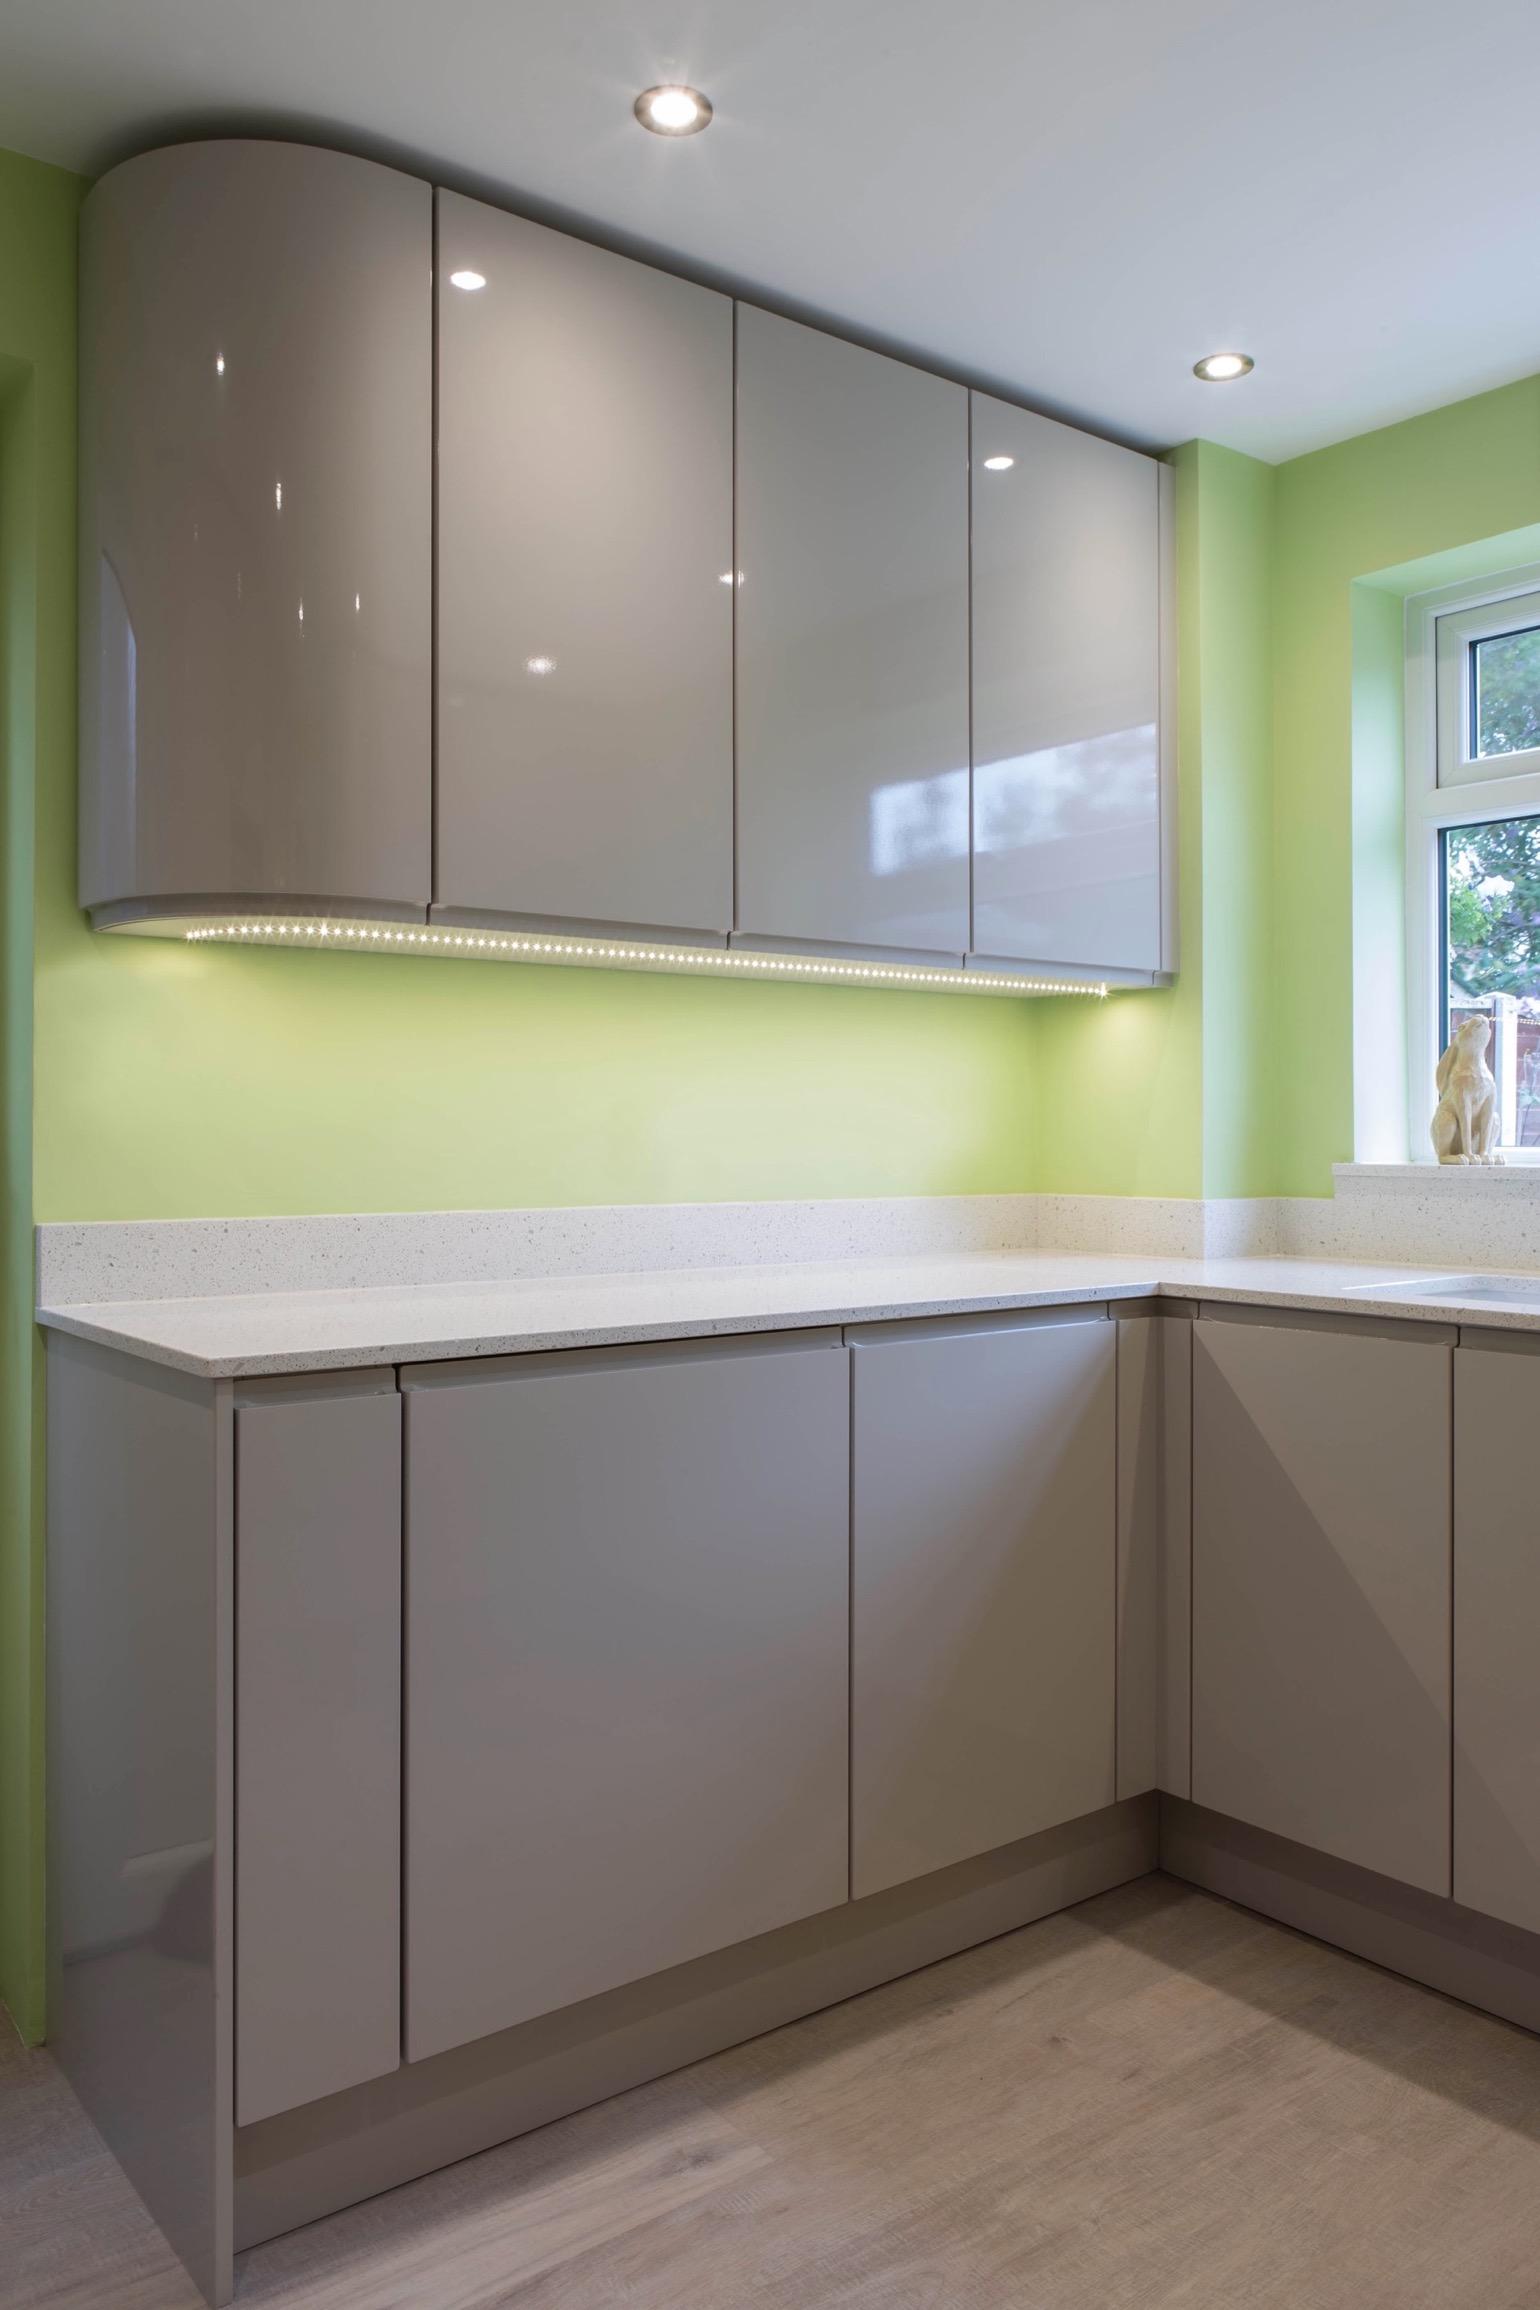 gloss handleless kitchen quartz worktop curved cupboard aylesbury buckinghamshire 1